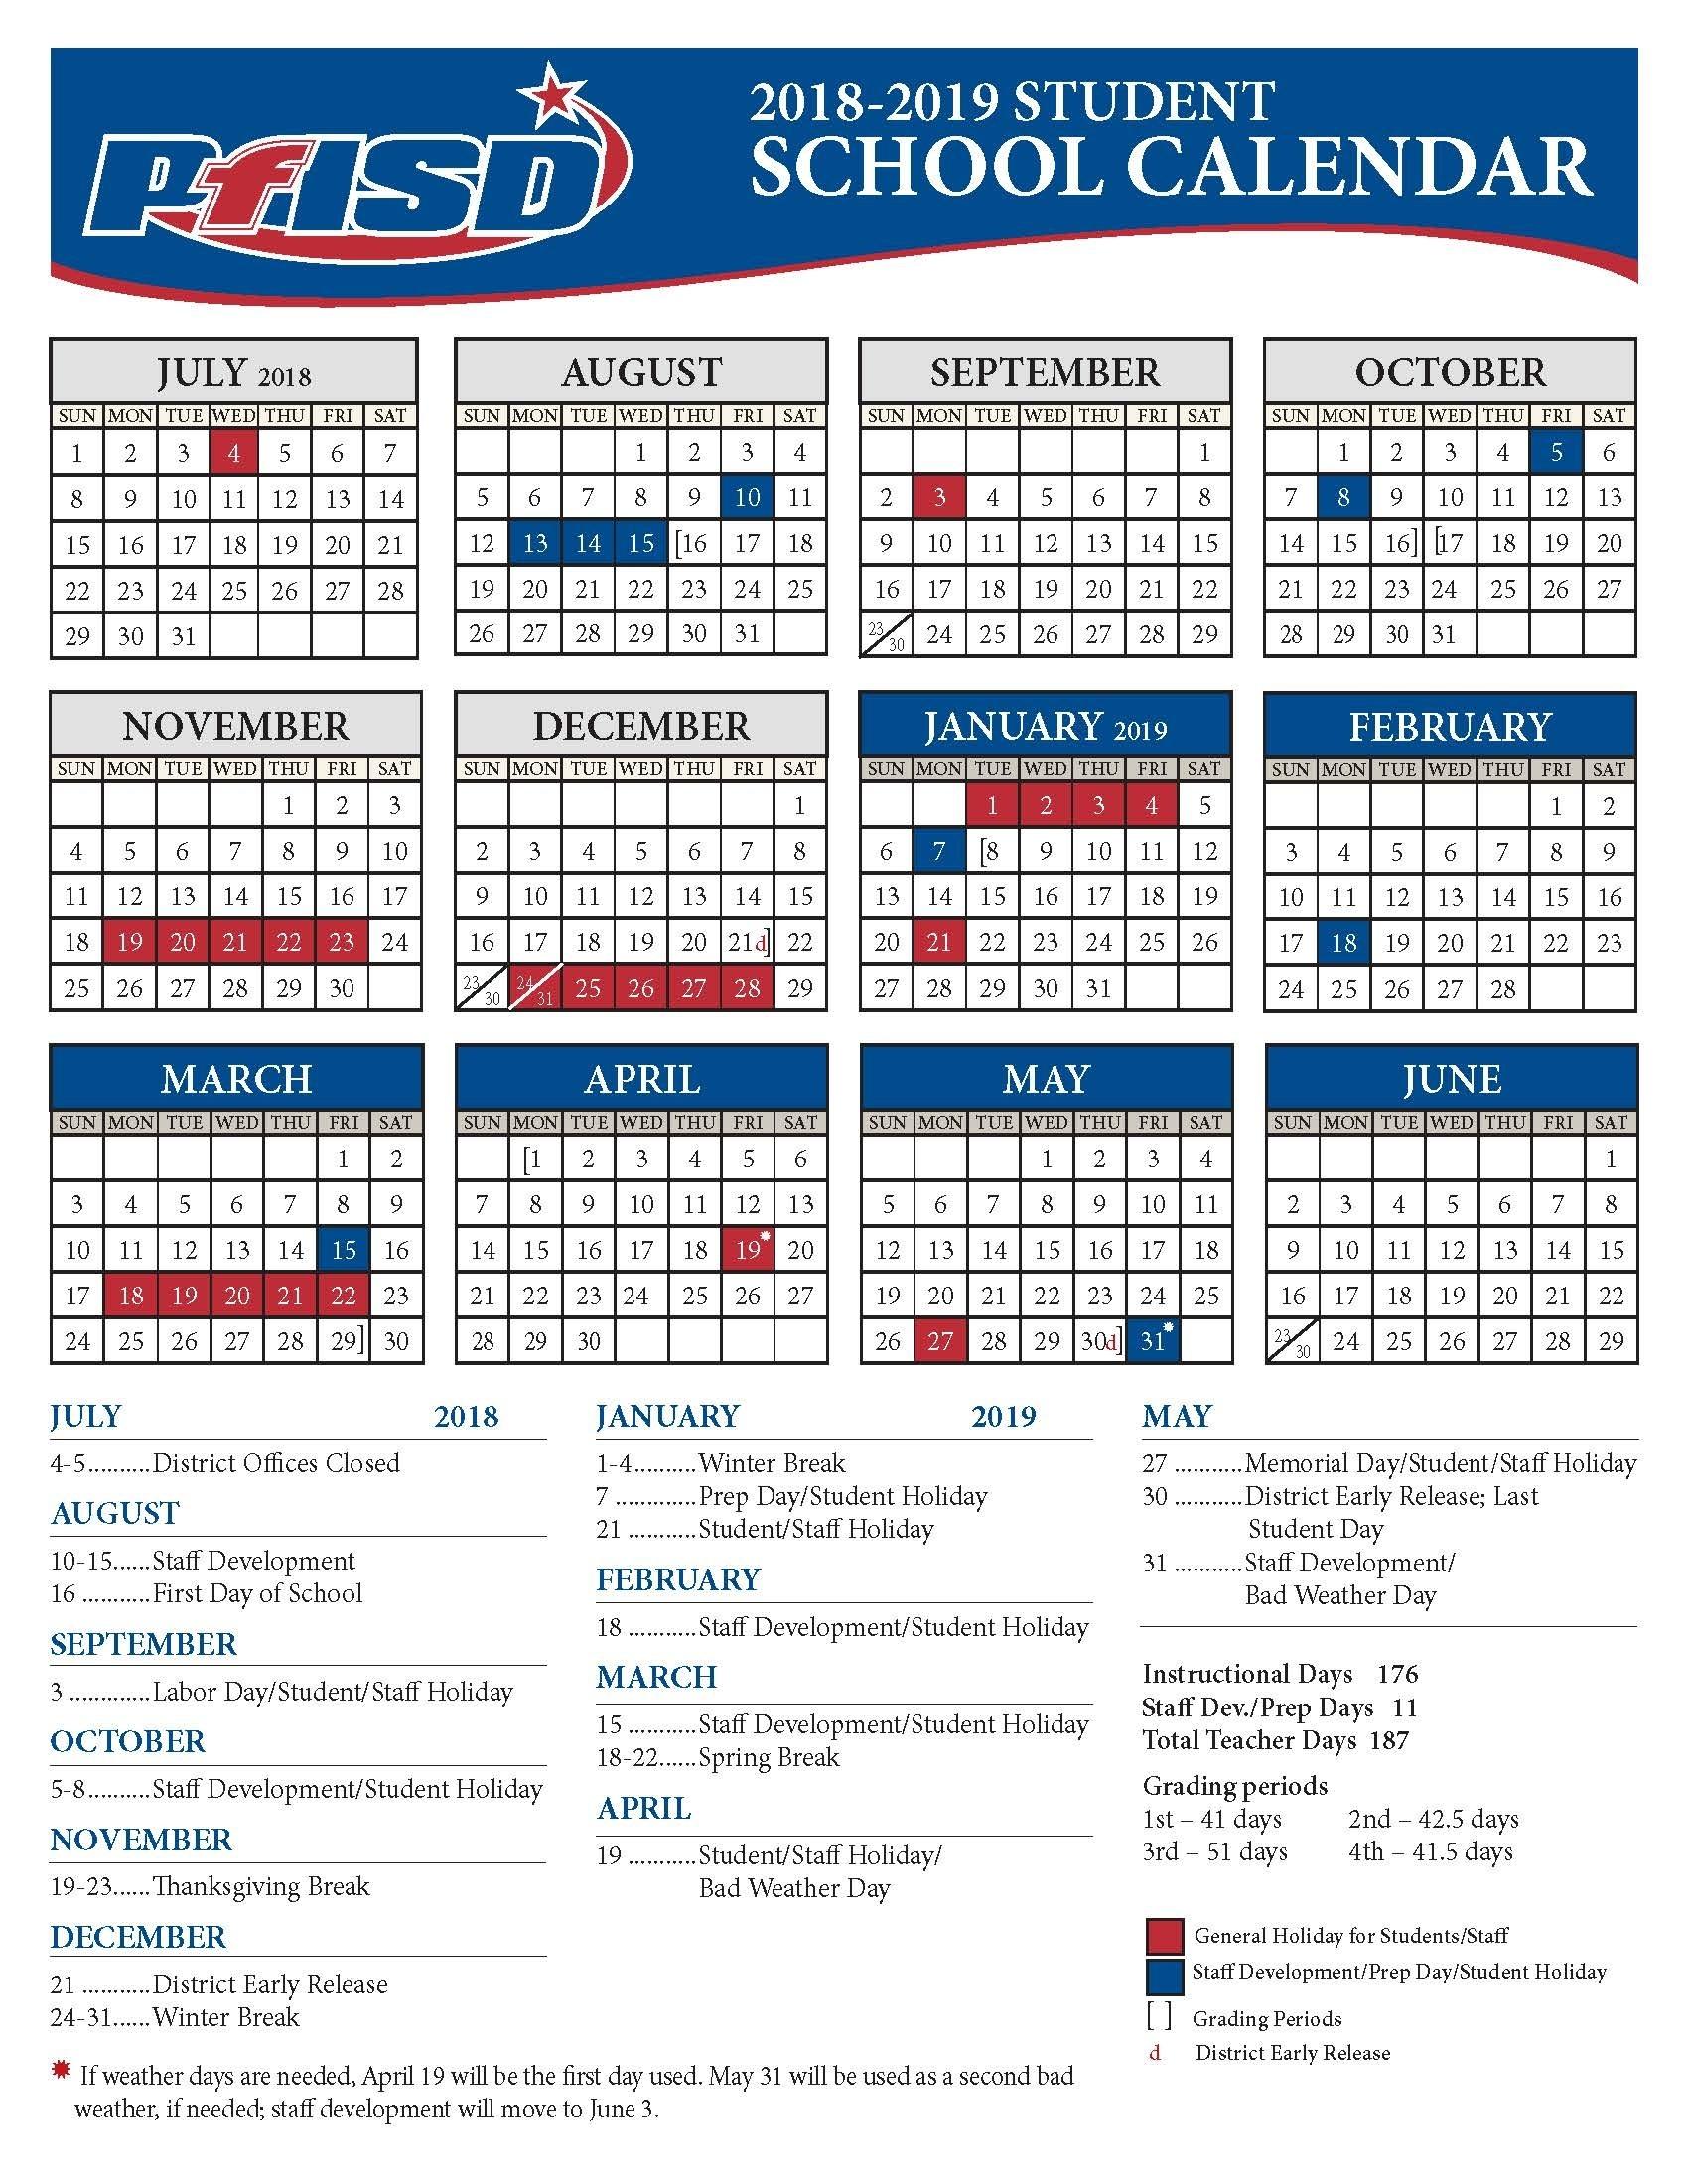 School Year Calendar / 2018-2019 District Calendar Incredible School Calendar District 2